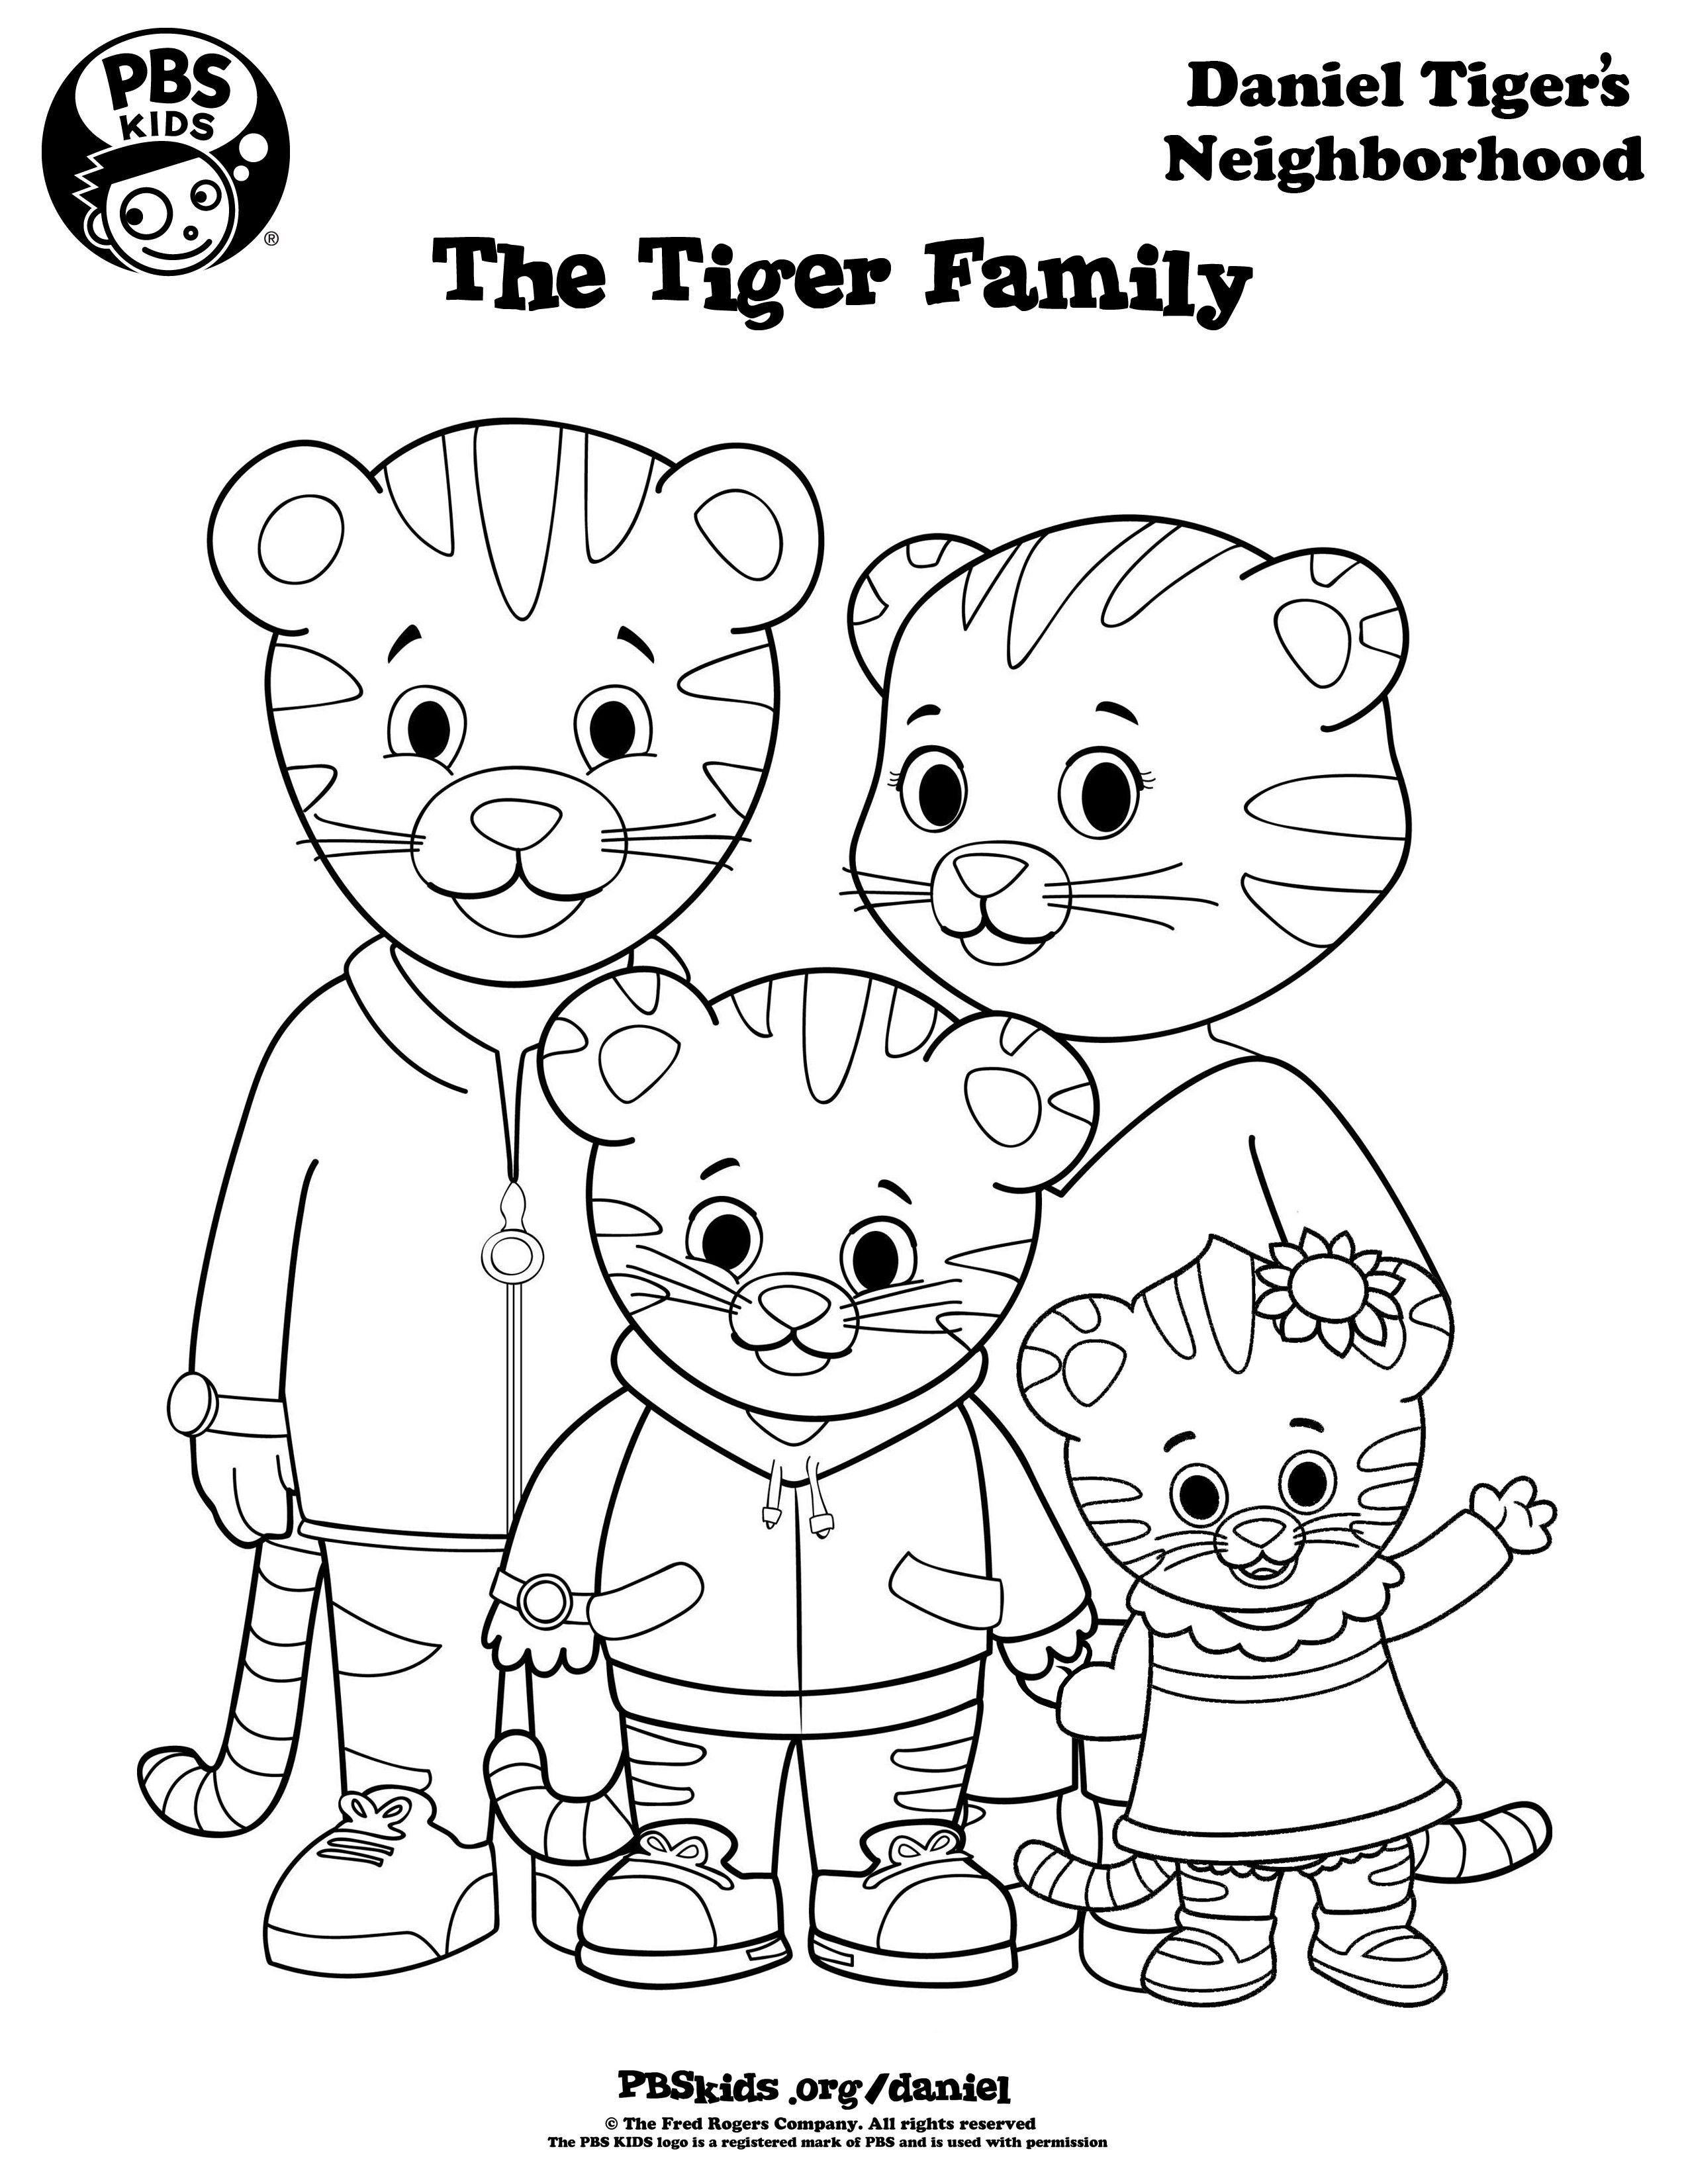 Daniel Tiger Coloring Page Fresh Daniel Tiger Printable Coloring Pages Daniel Tiger S Neighborhood Daniel Tiger Family Coloring Pages